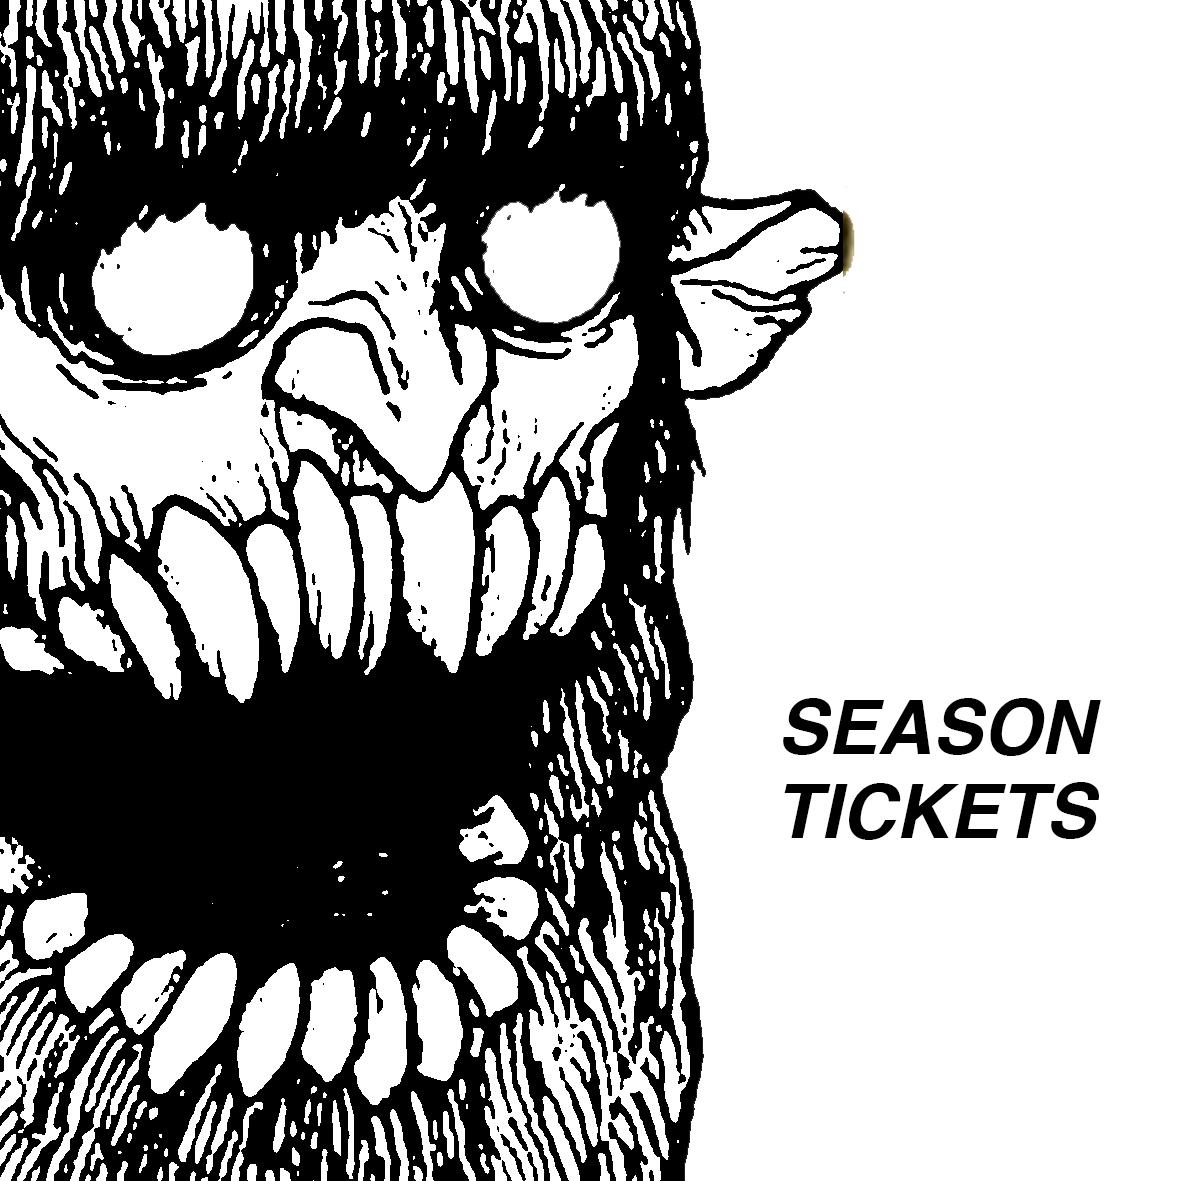 Season Ticket Holder 2